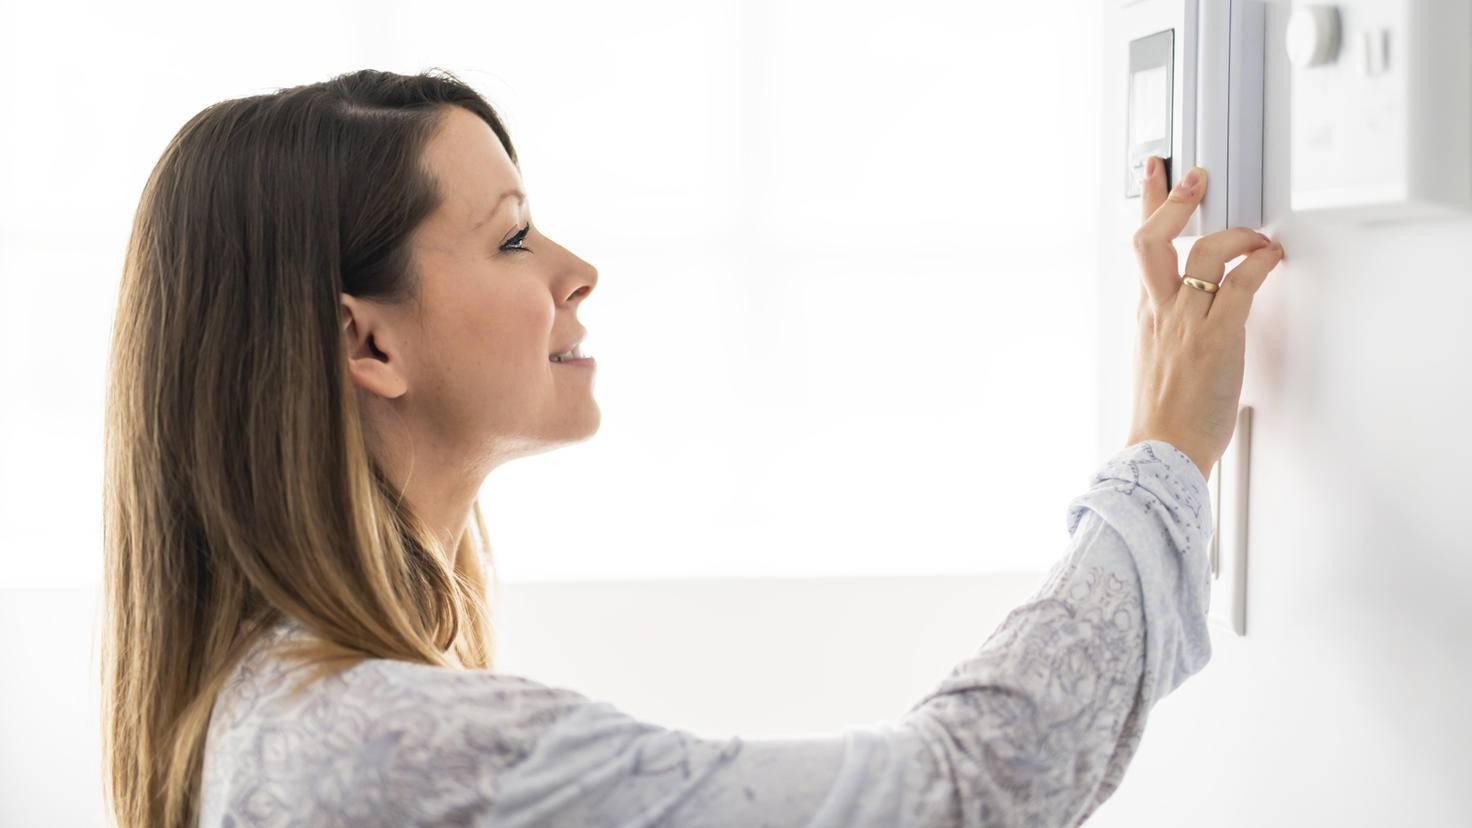 Display-Thermostat-Stromzähler-Frau-pololia-AdobeStock_233253593